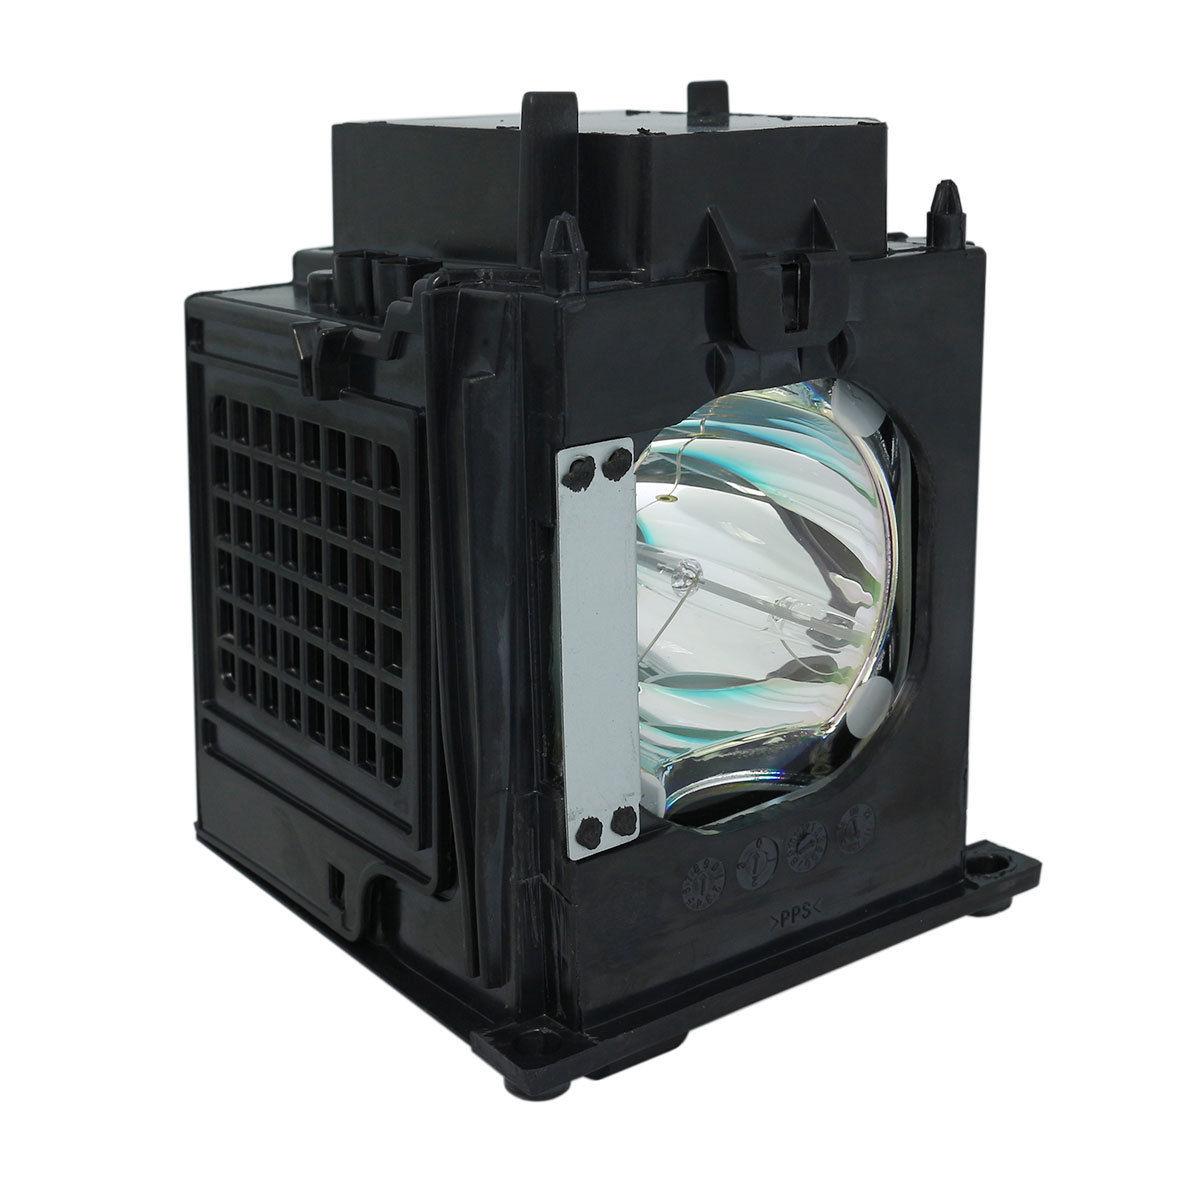 Mitsubishi Tv Tech Support: TV Lamp 915P049010 For Mitsubishi WD 52631 WD 57731